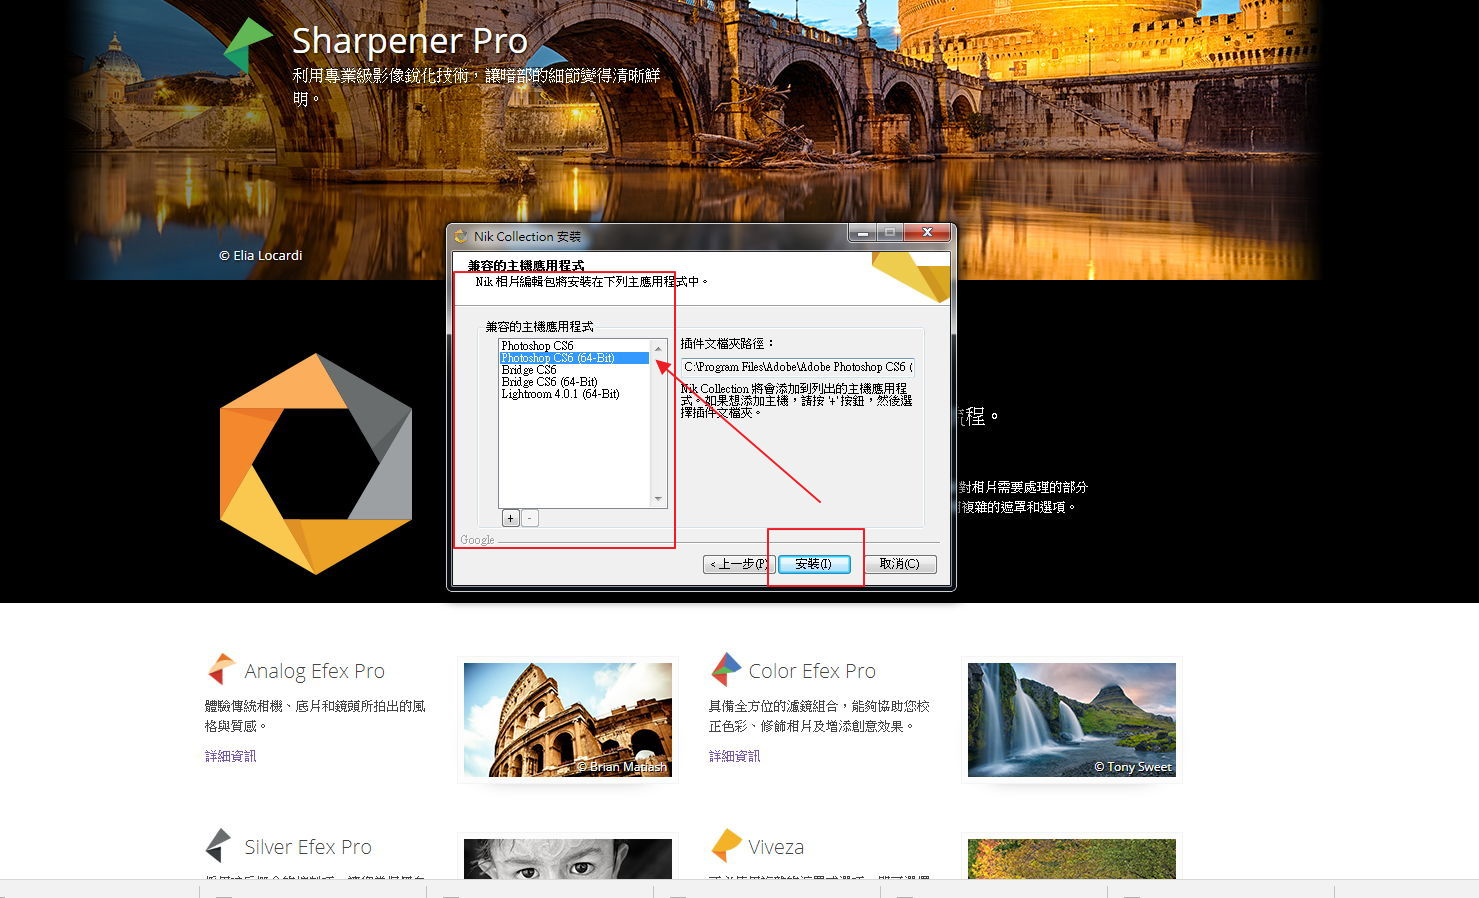 【PS滤镜】专业级免费PHOTOSHOP滤镜下载